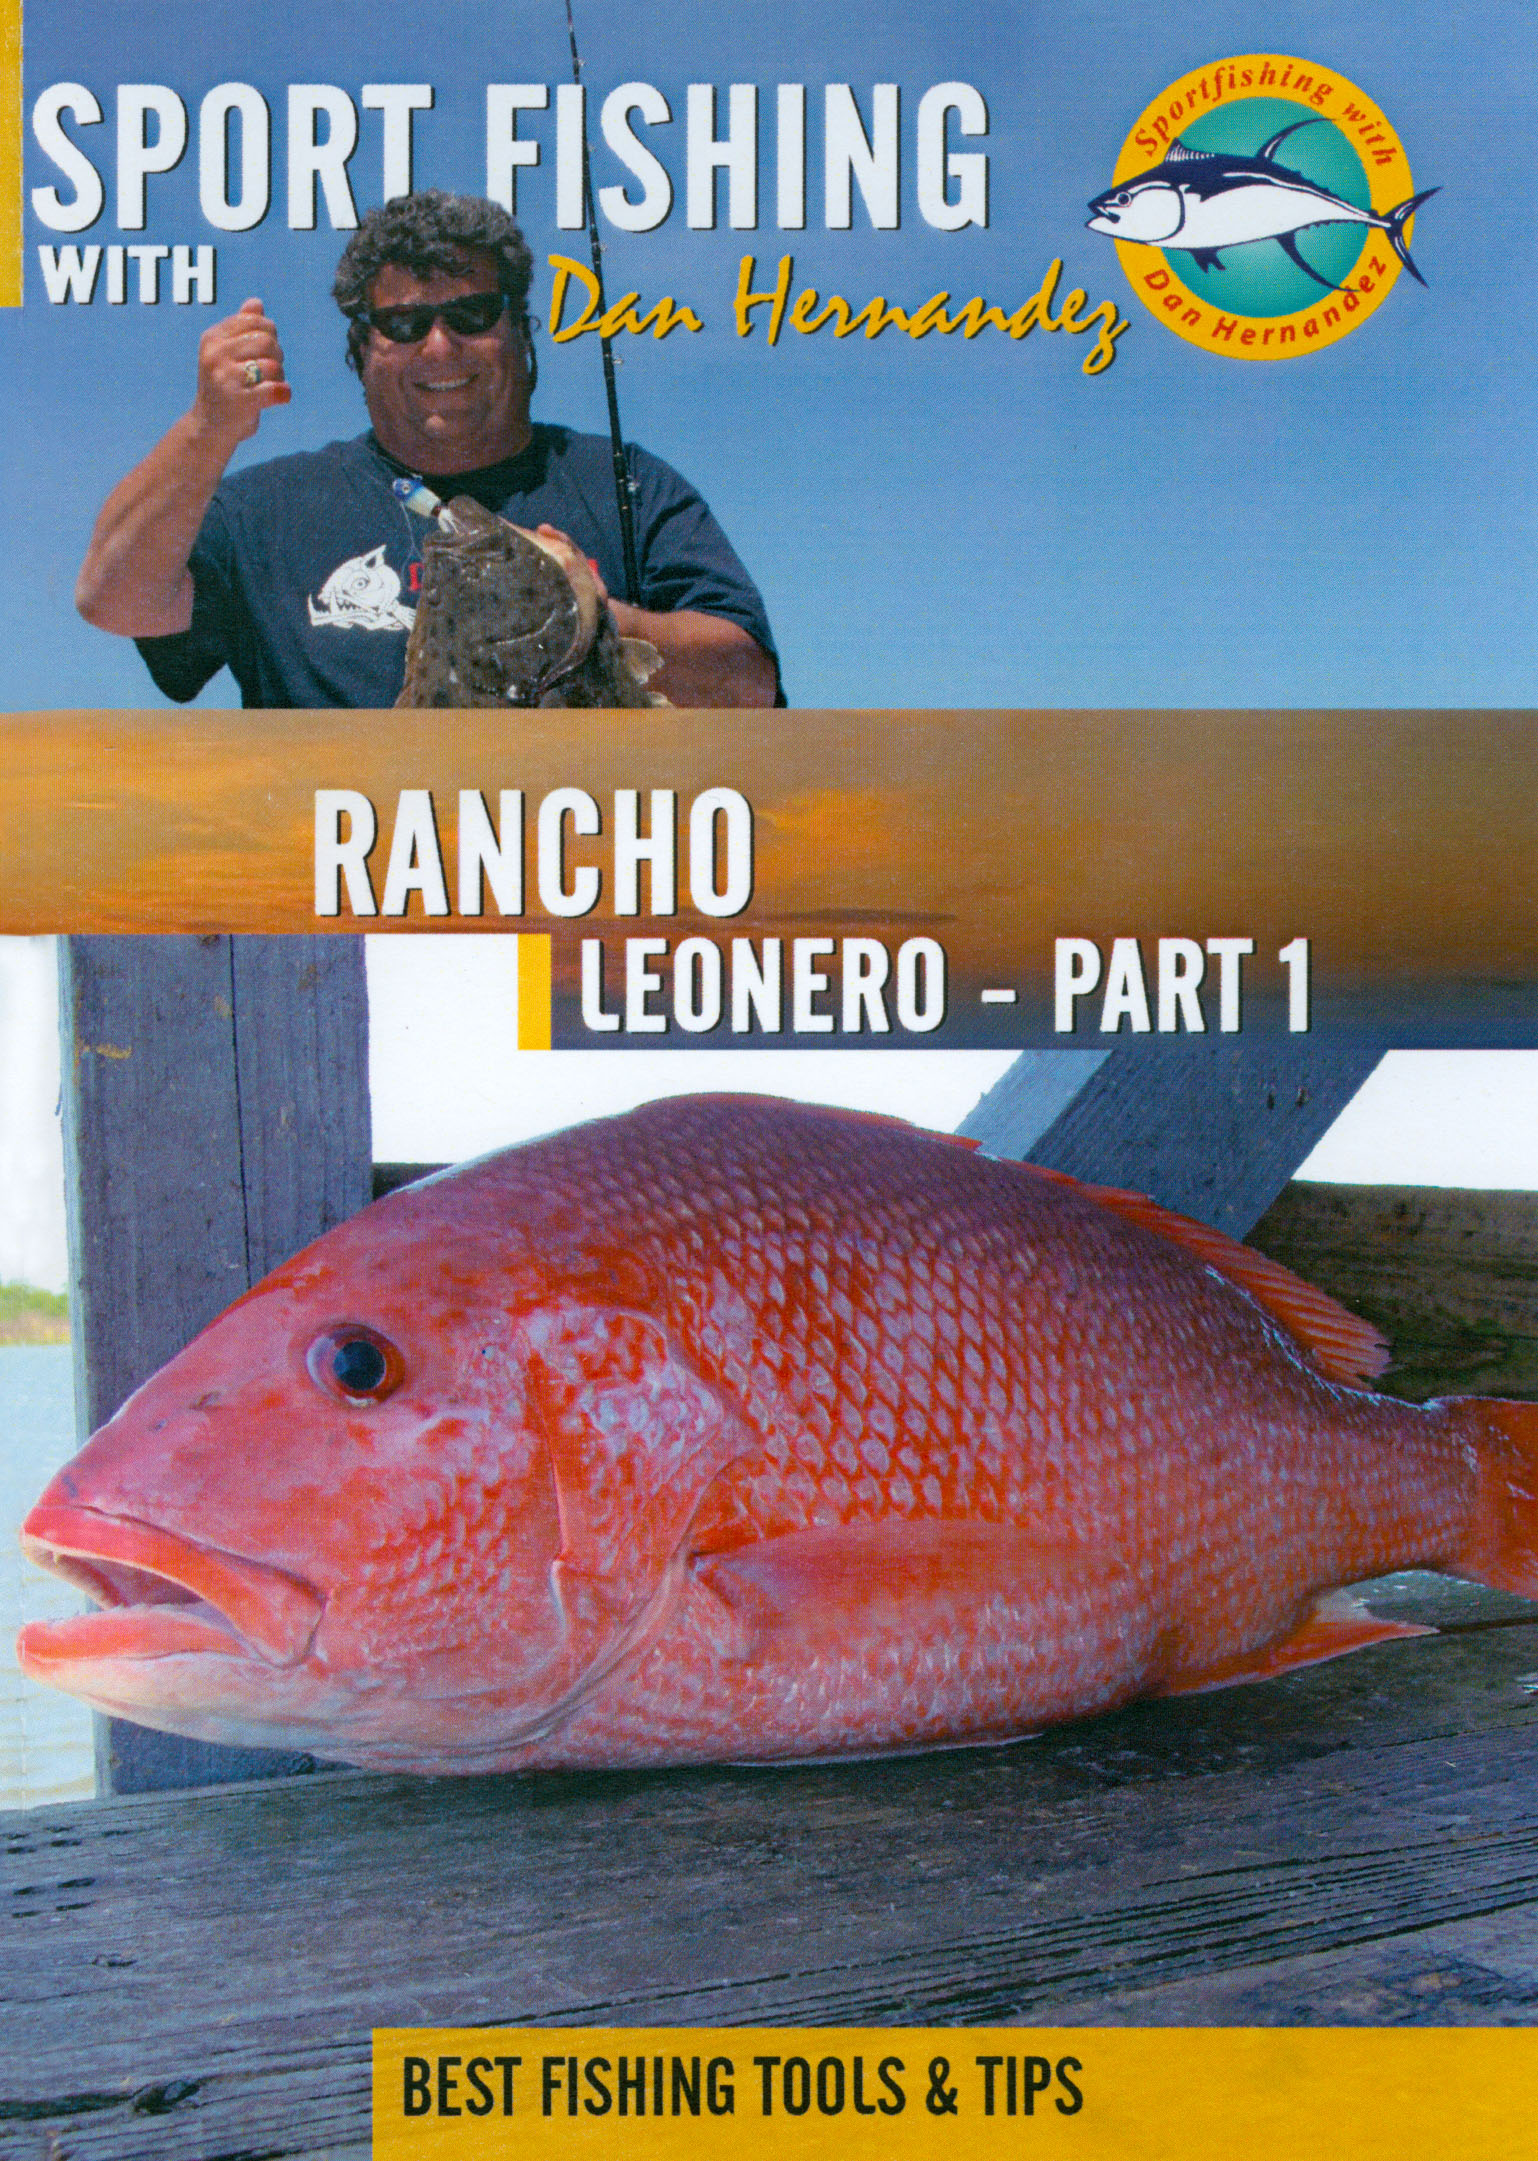 Sport Fishing With Dan Hernandez: Rancho Leonero, Part 1